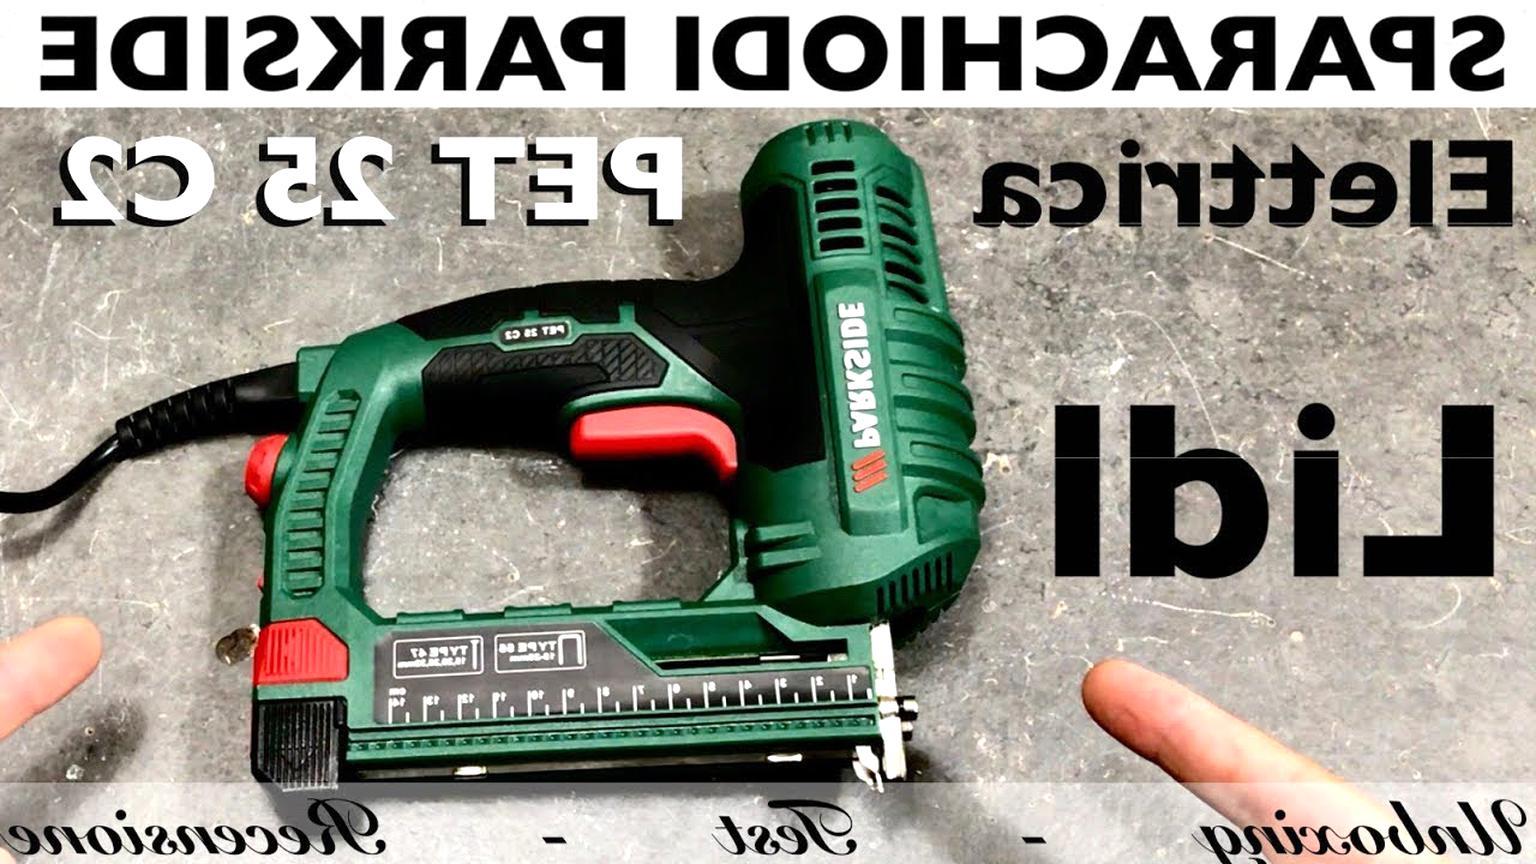 Spillatrice chioadatrice sparachiodi elettrica fissatrice bricolage ecotak 114b